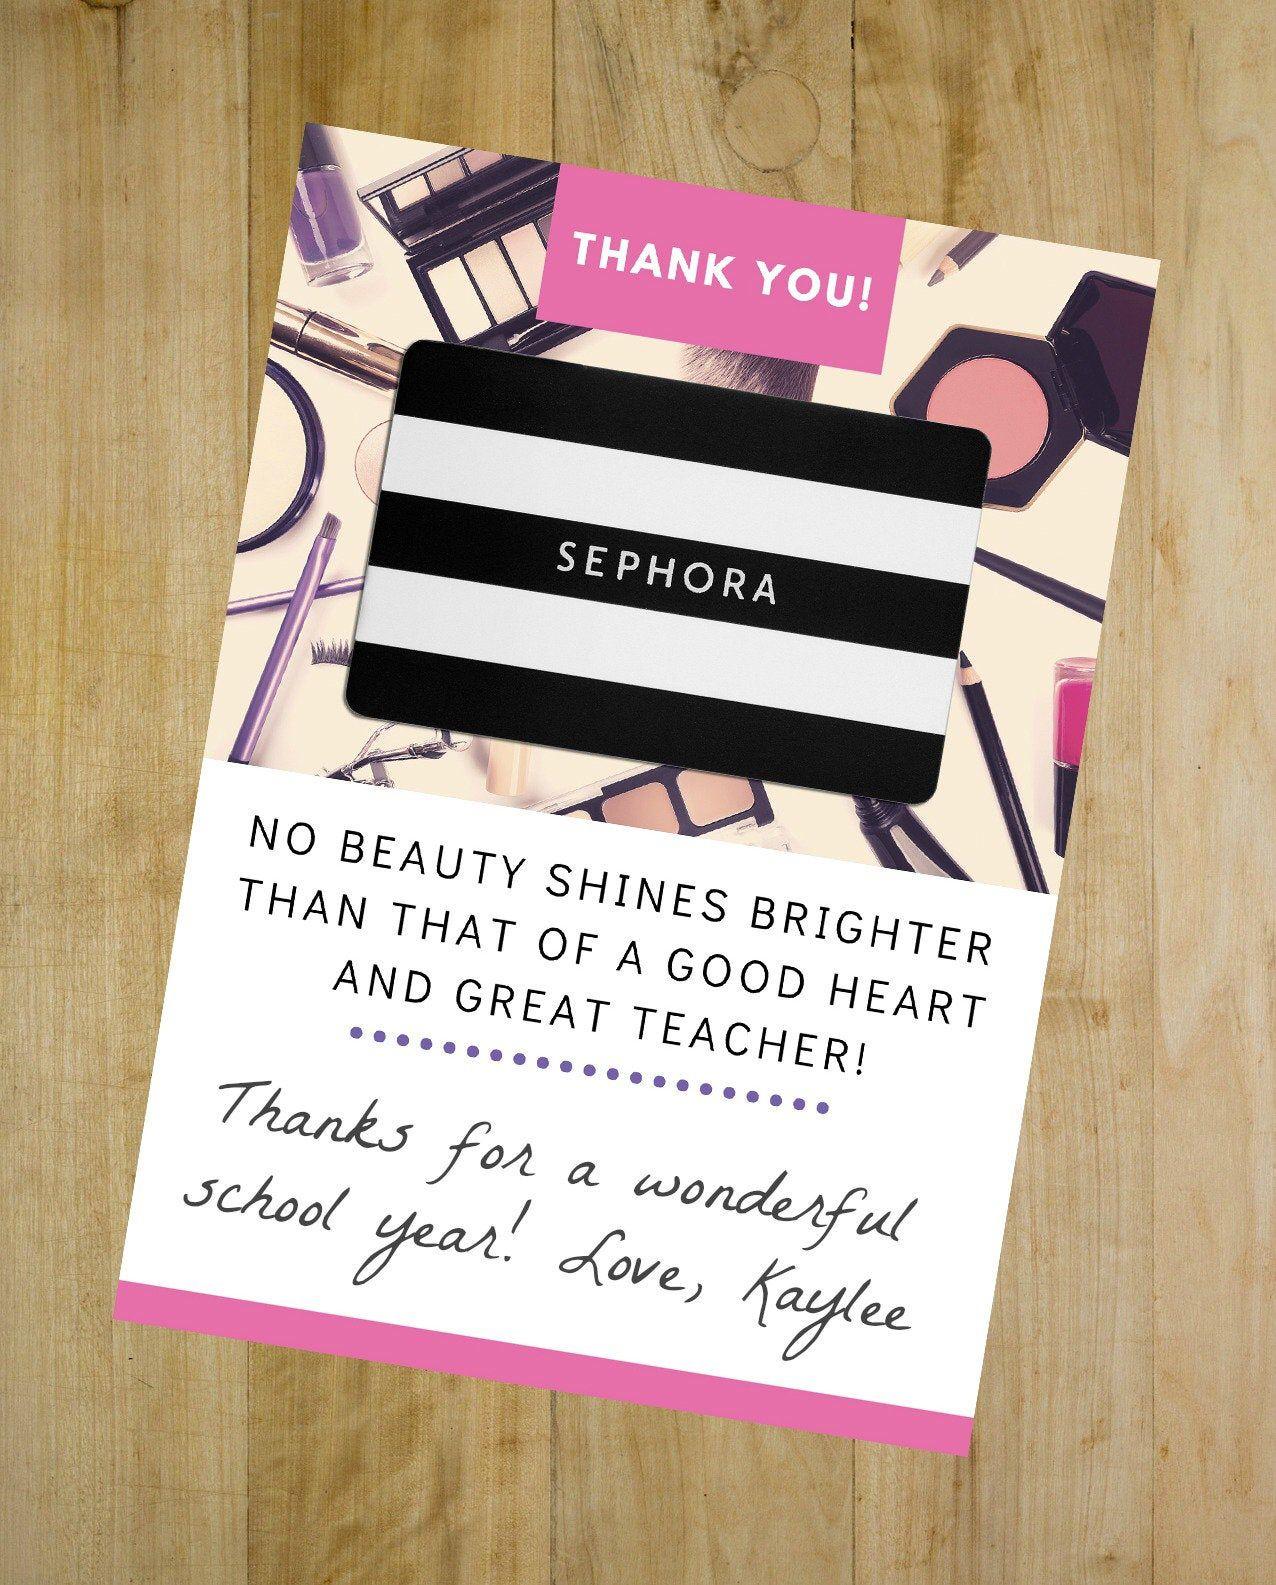 Sephoras Christmas Event Bag 2021 Teacher Appreciation Gift Printable Sephora Gift Card Holder Etsy In 2021 Sephora Gift Card Teacher Gift Card Teacher Appreciation Gifts